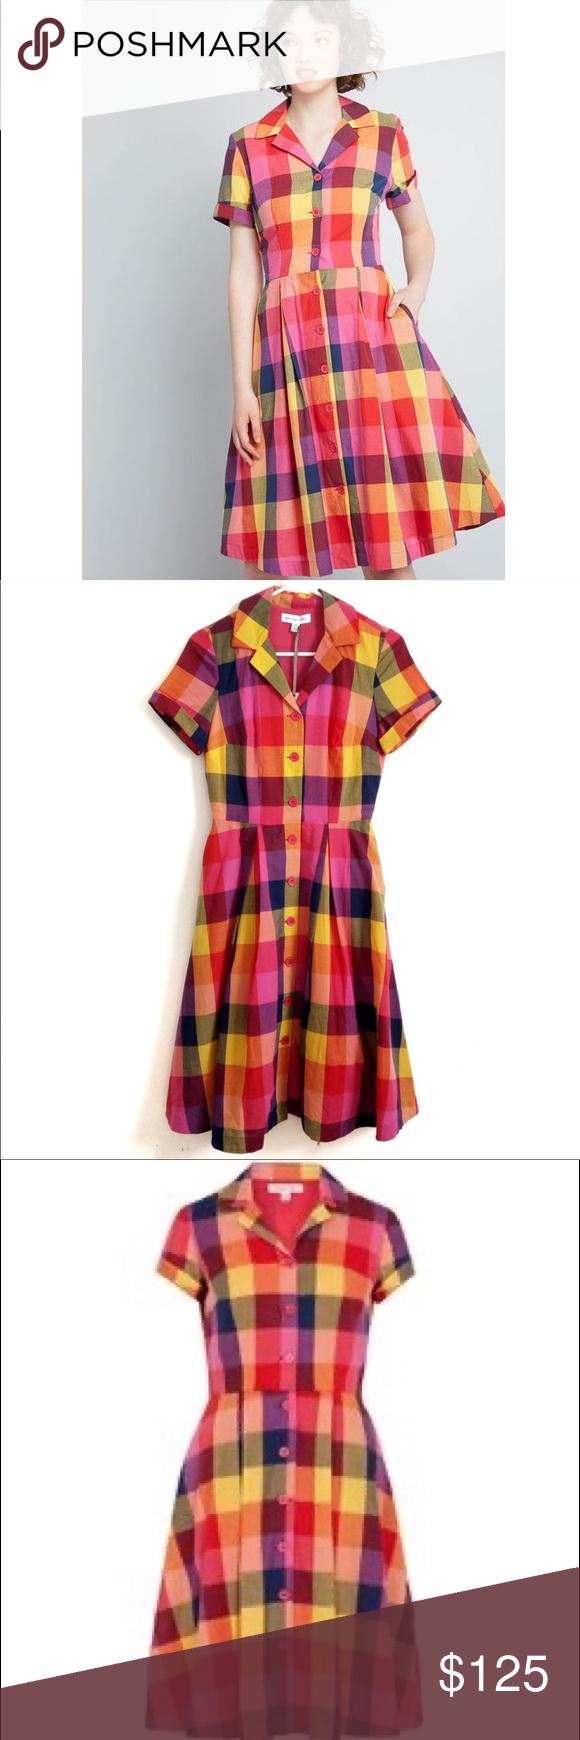 ModCloth x Emily & Fin Kate Rainbow Plaid Dress